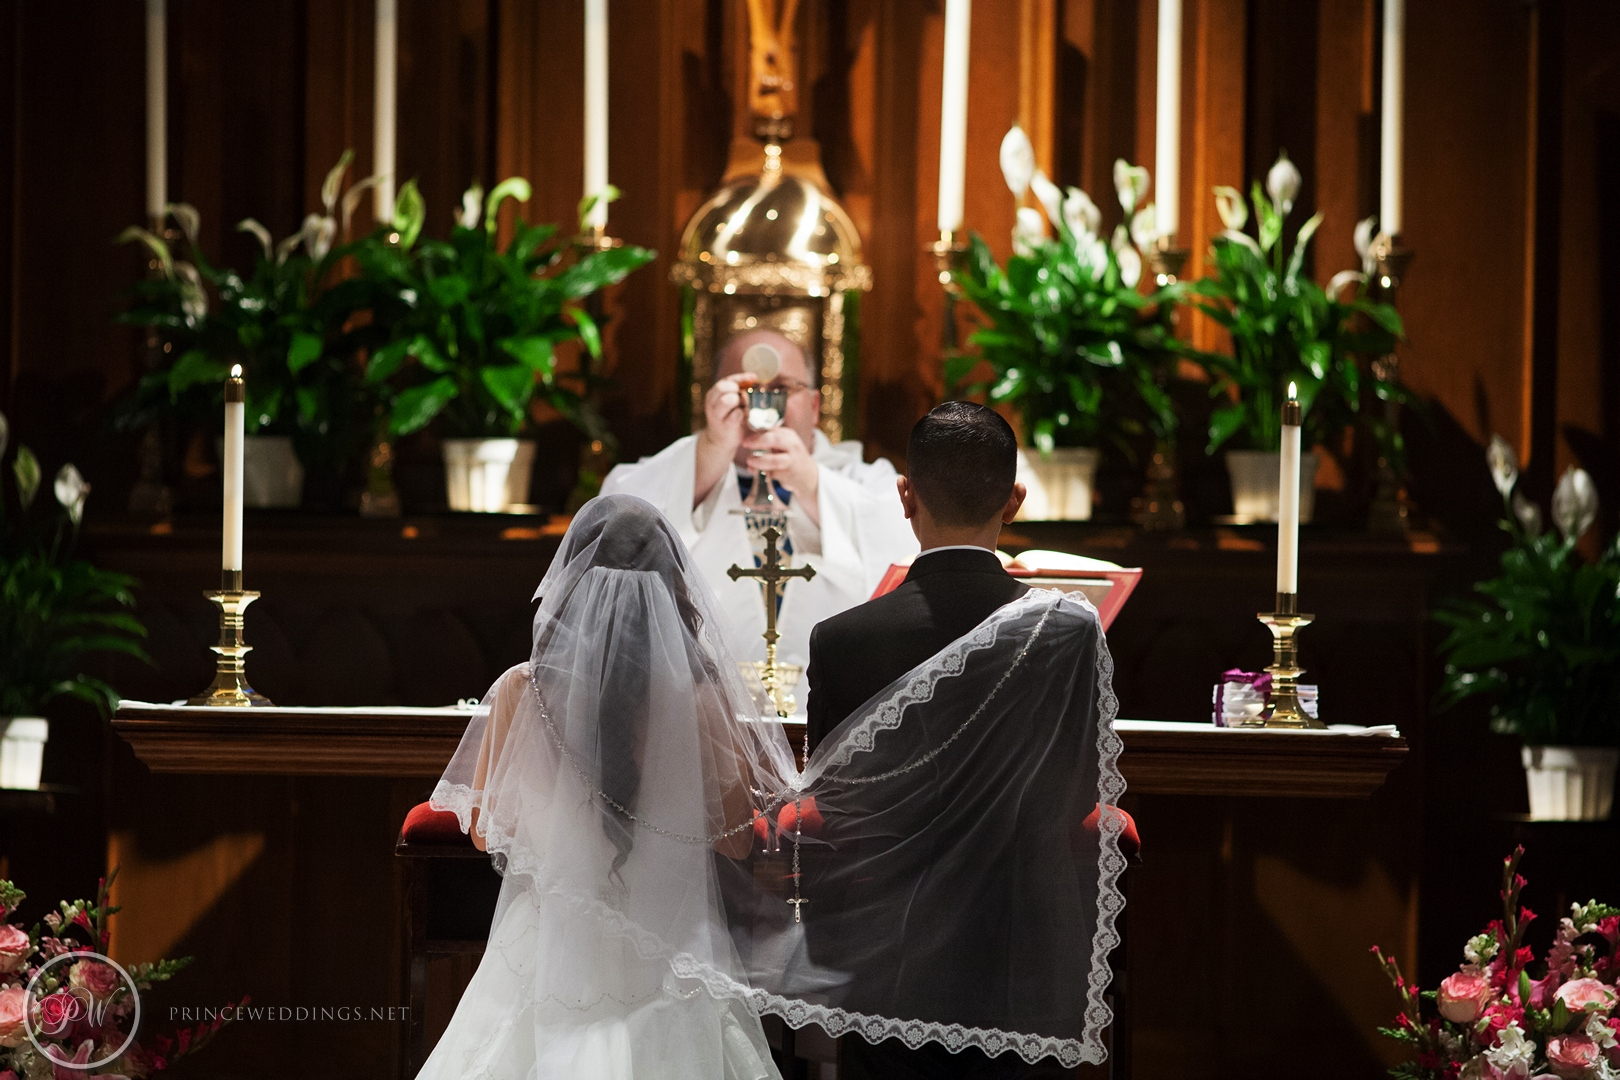 Castaway_Burbank_Wedding_Photo_Christian_Autumn038.jpg